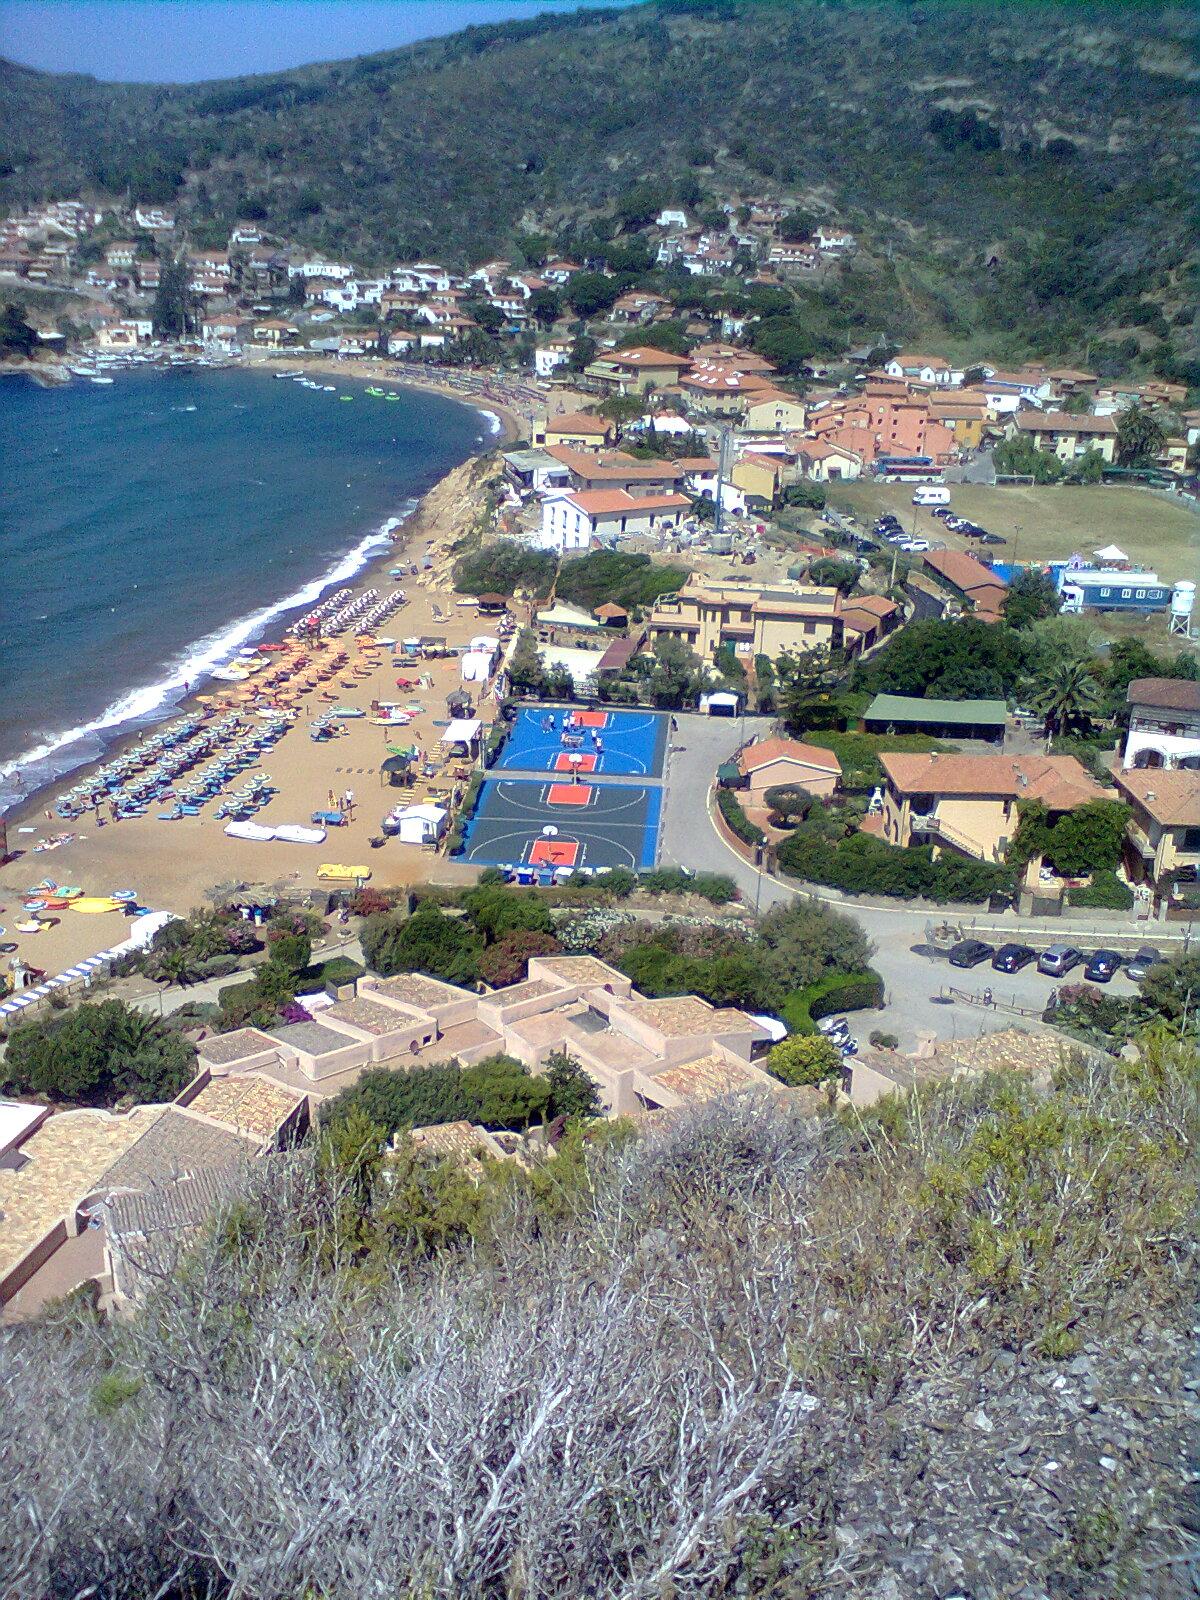 basketball camp arcipelago toscano isola del giglio campese giglionews